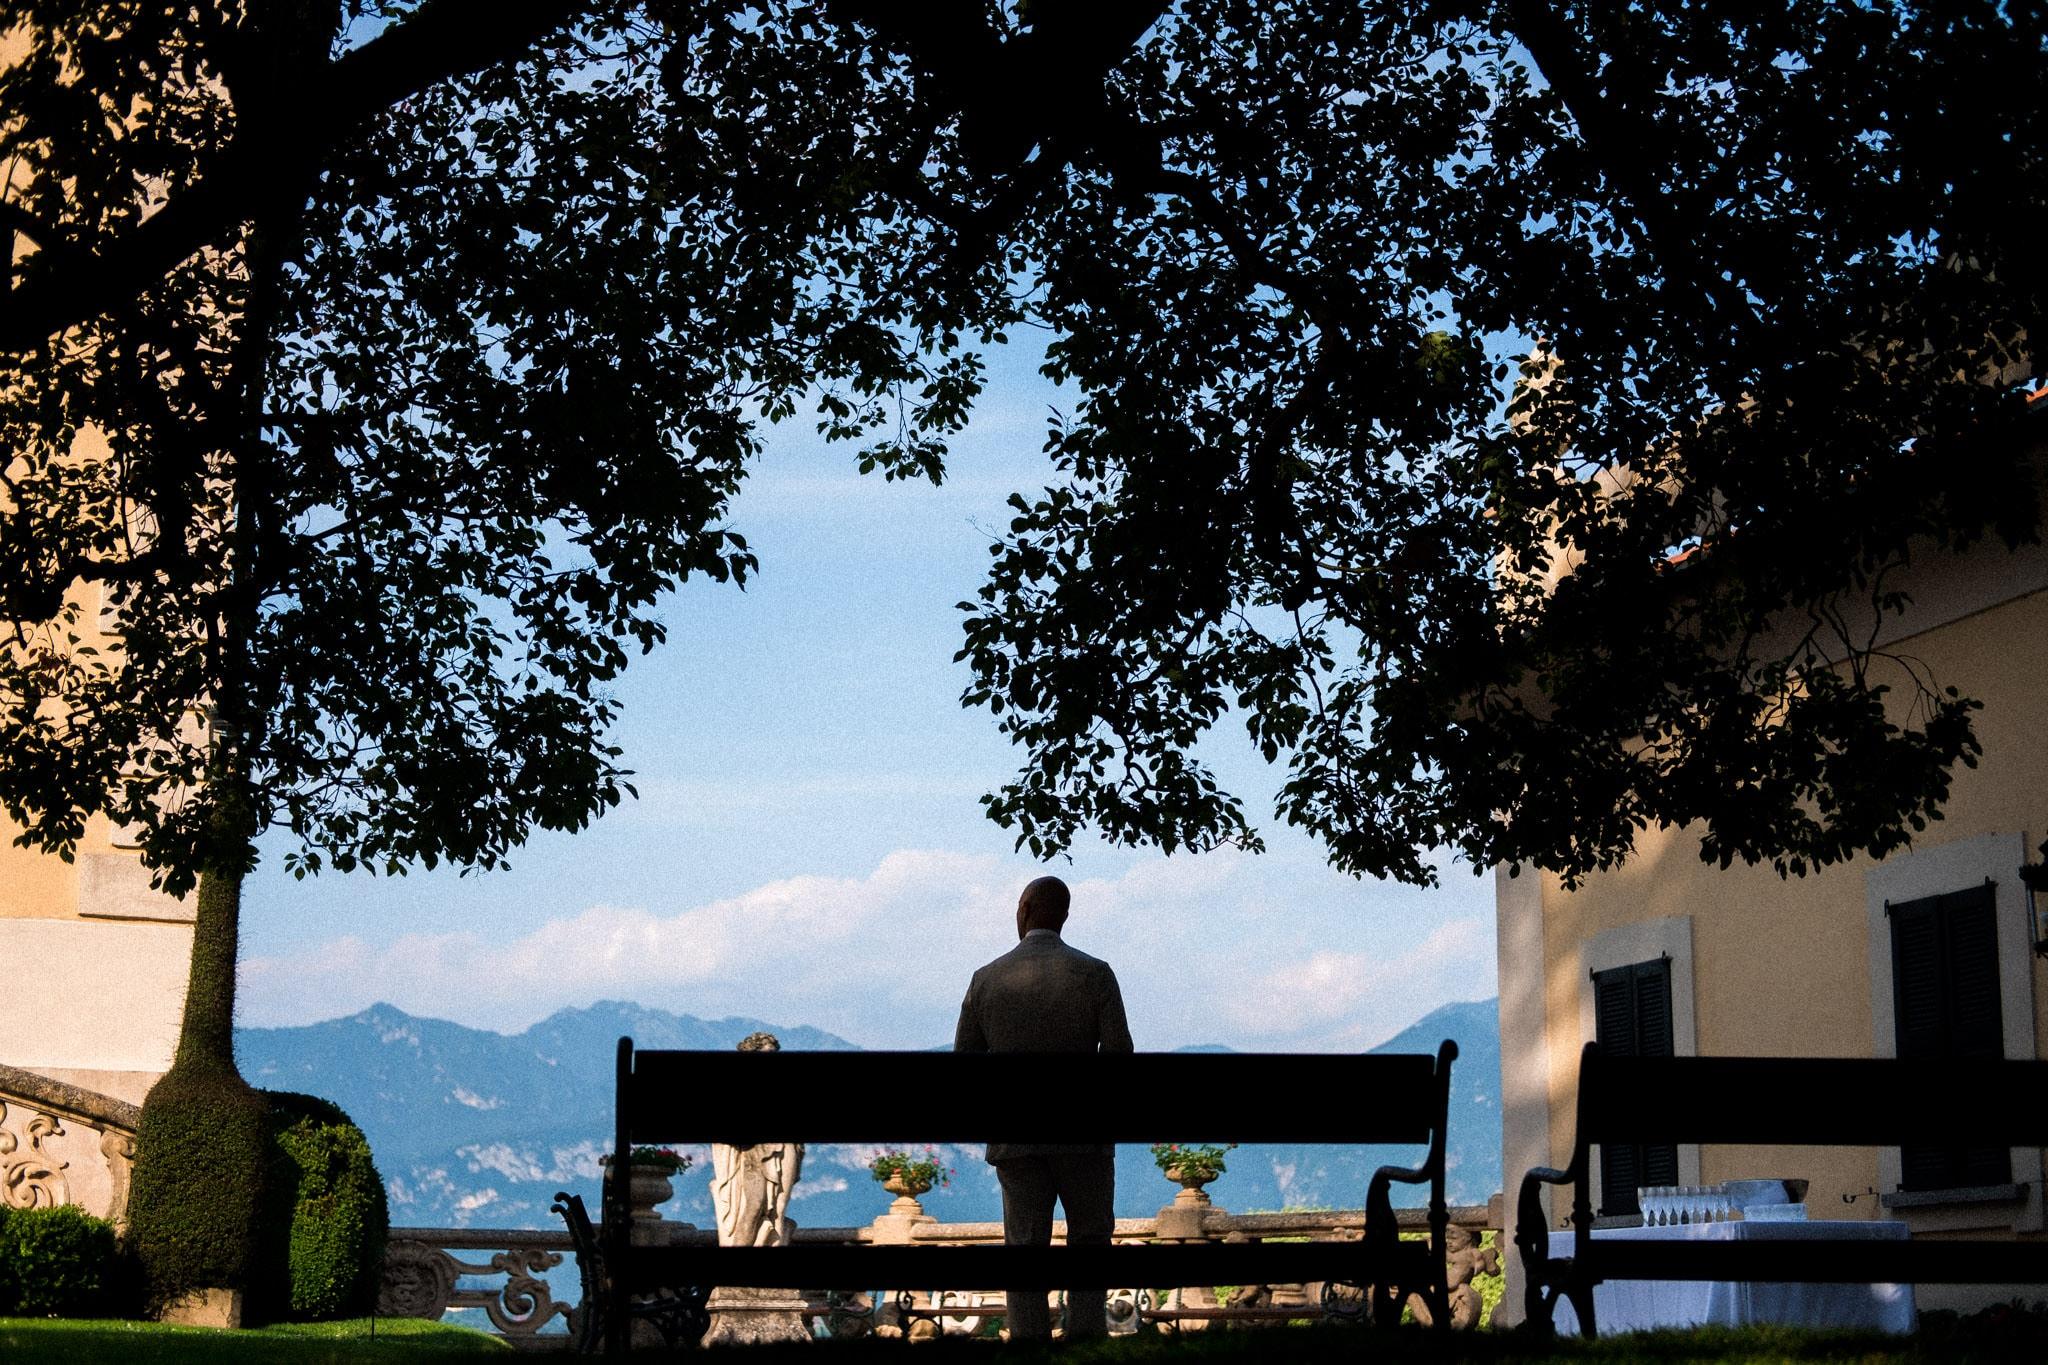 fotografo matrimonio como villa balbianello destination wedding lucarossi 00028